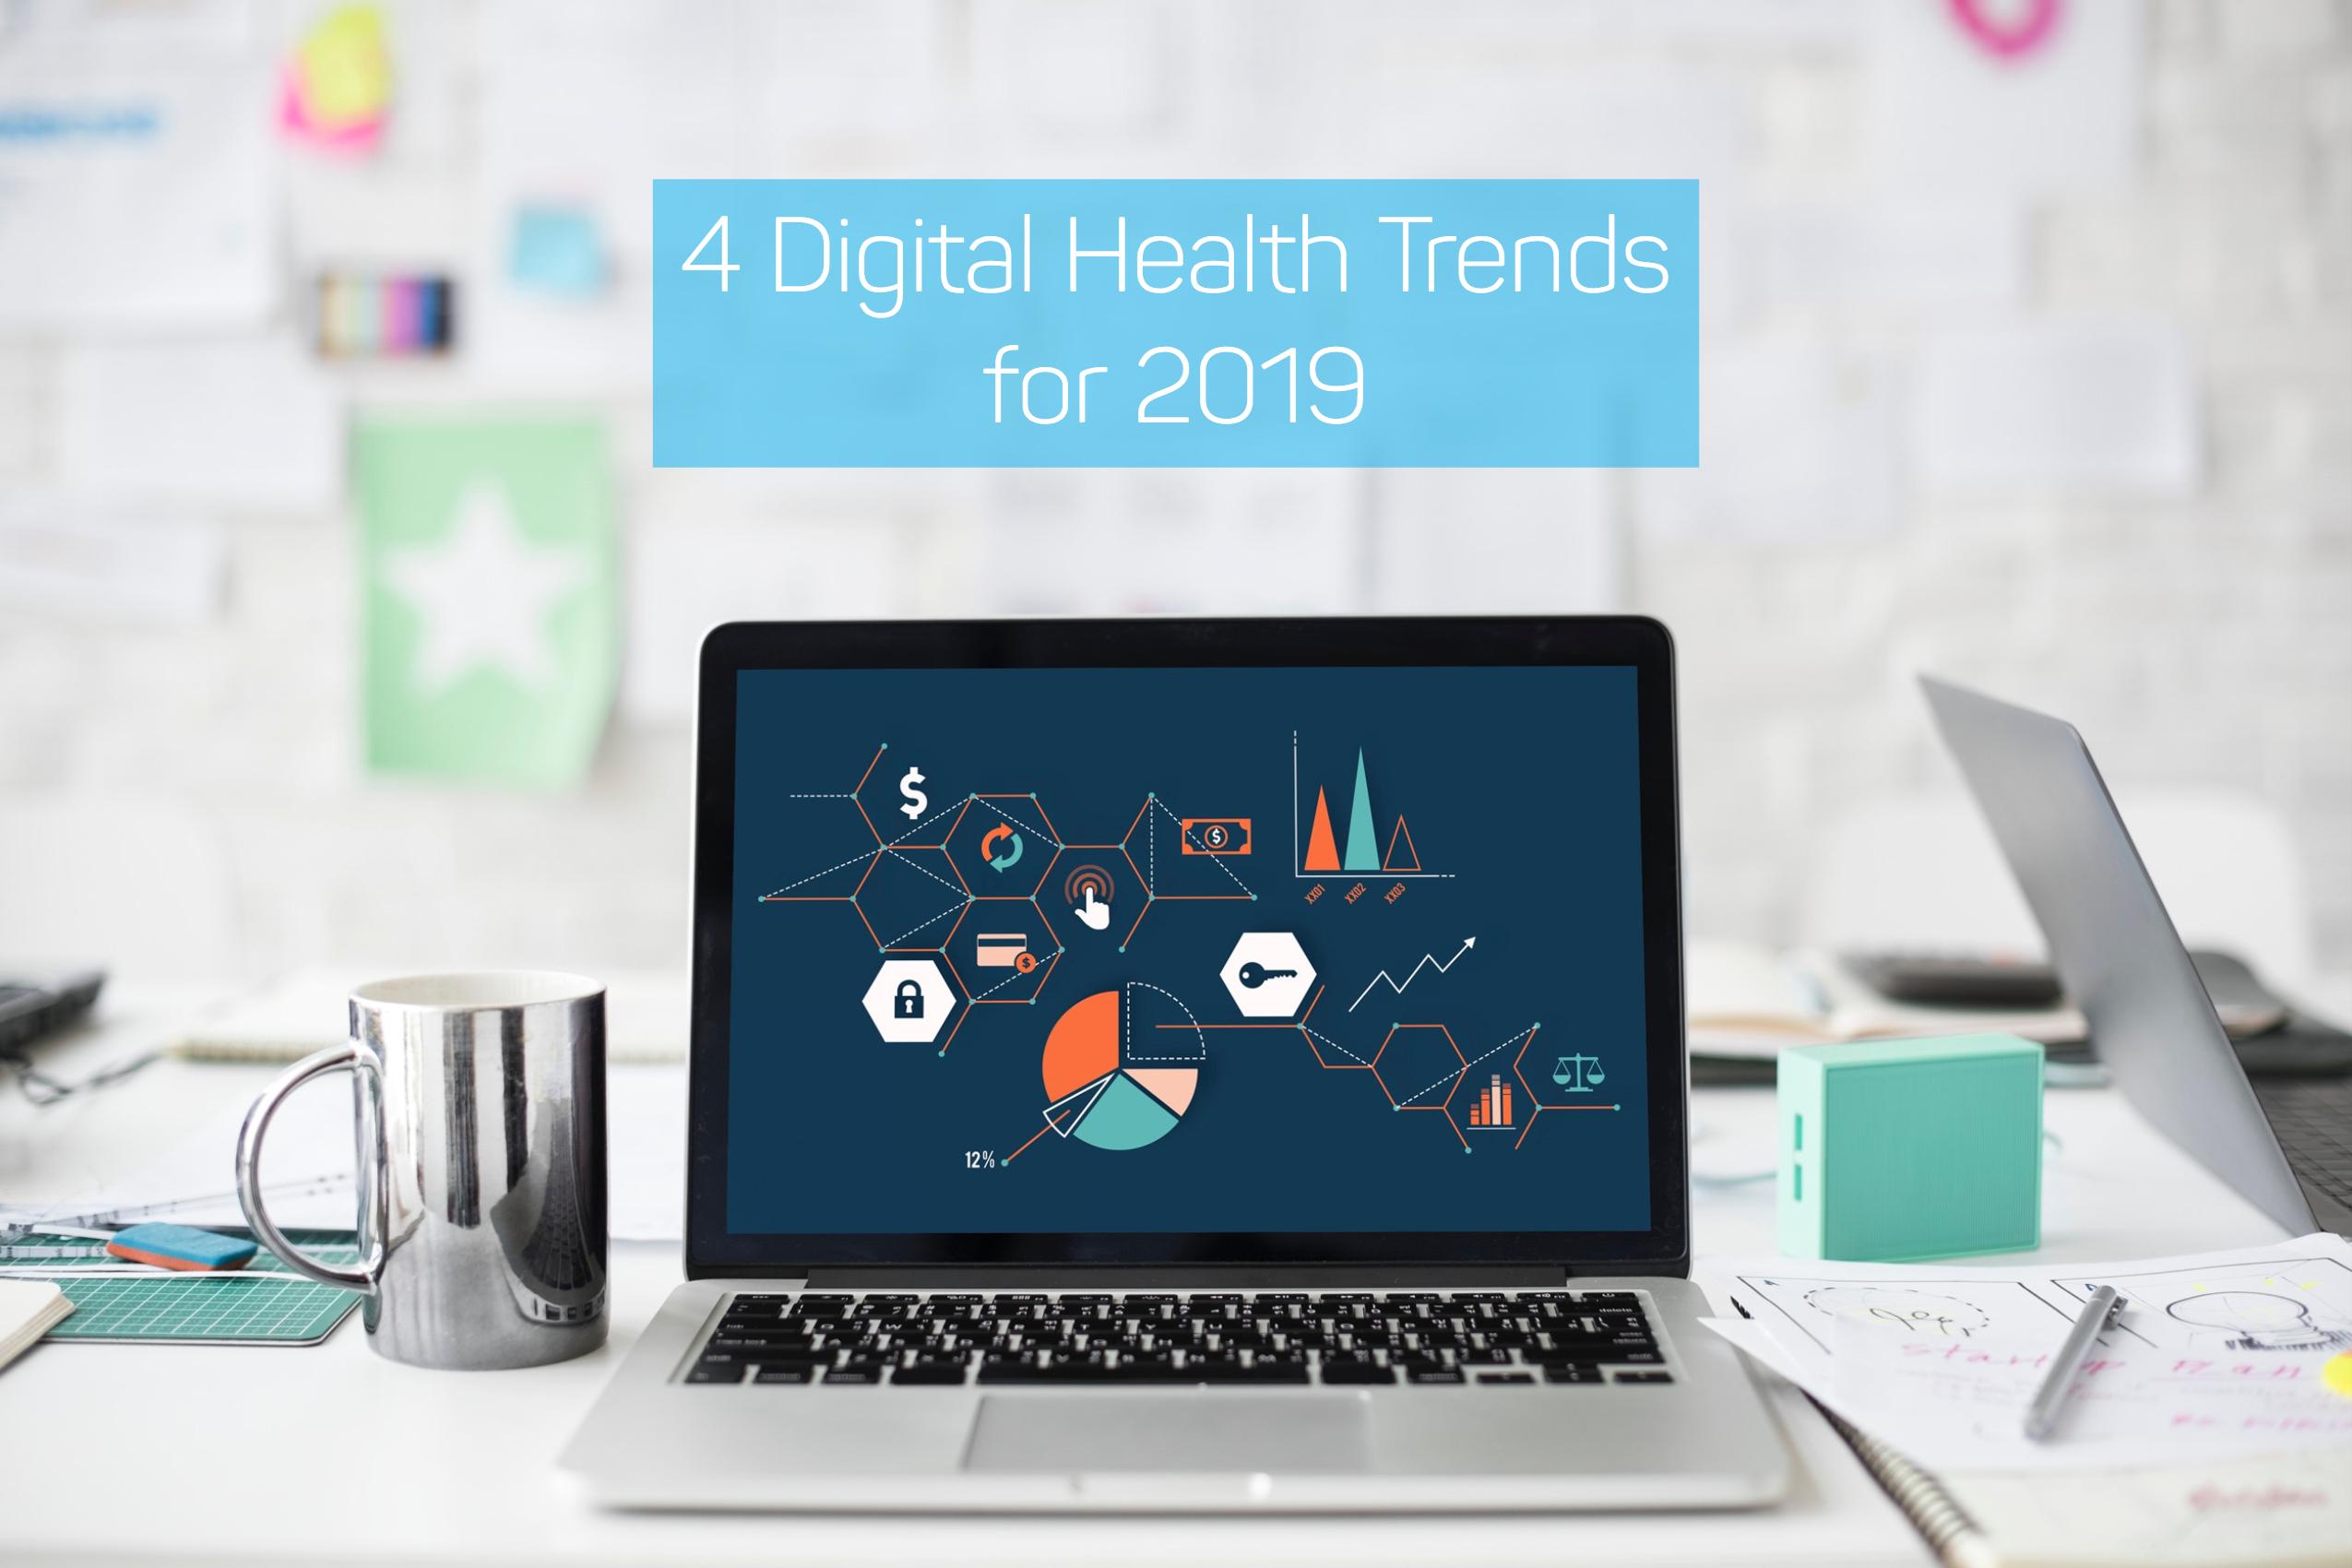 Blog - 4 Digital Health Trends